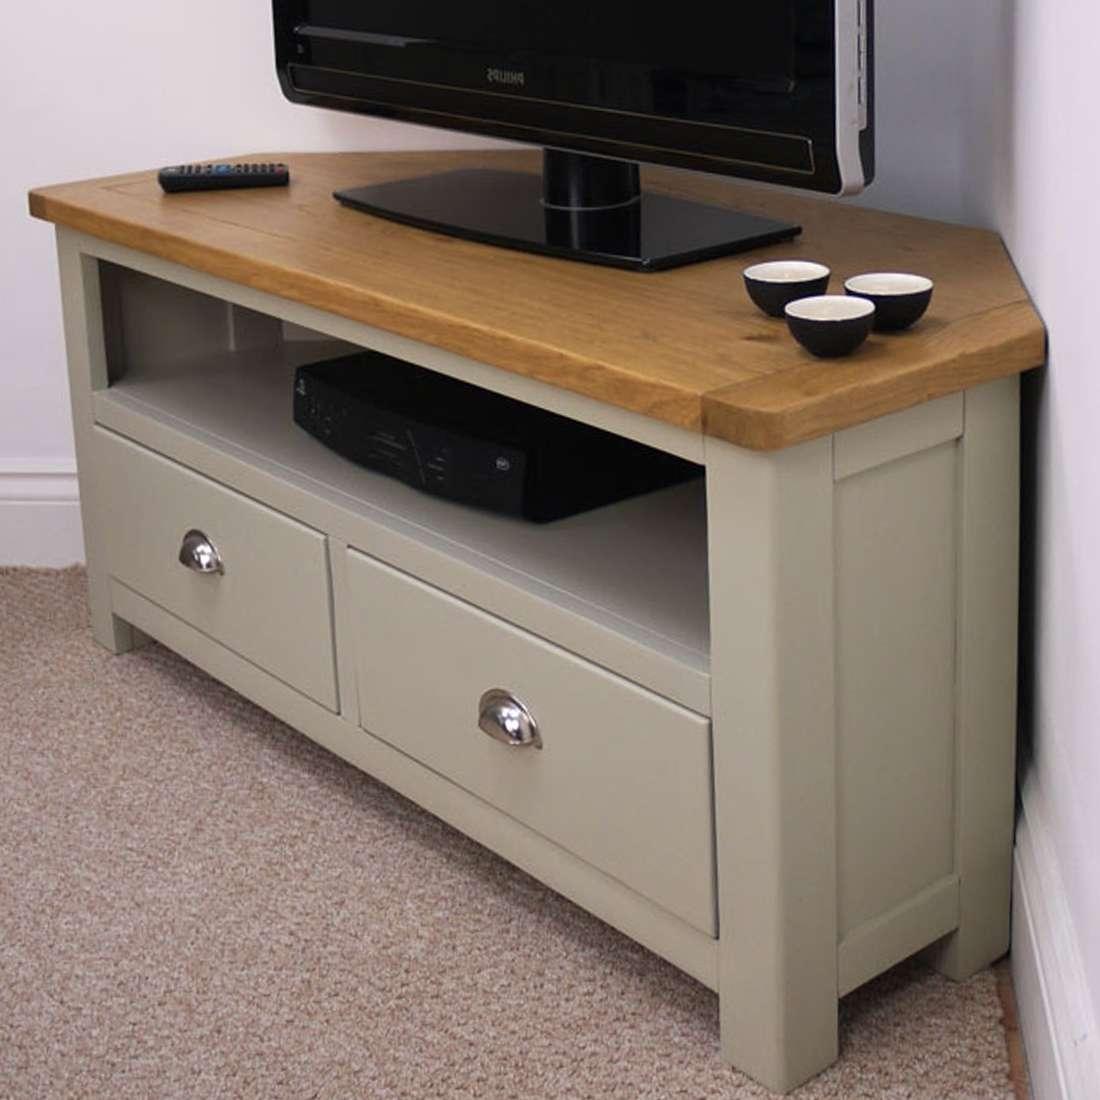 Aspen Oak Corner Tv Unit / Painted Tv Stand / Sage Grey With Oak With Regard To Oak Corner Tv Stands (View 1 of 15)